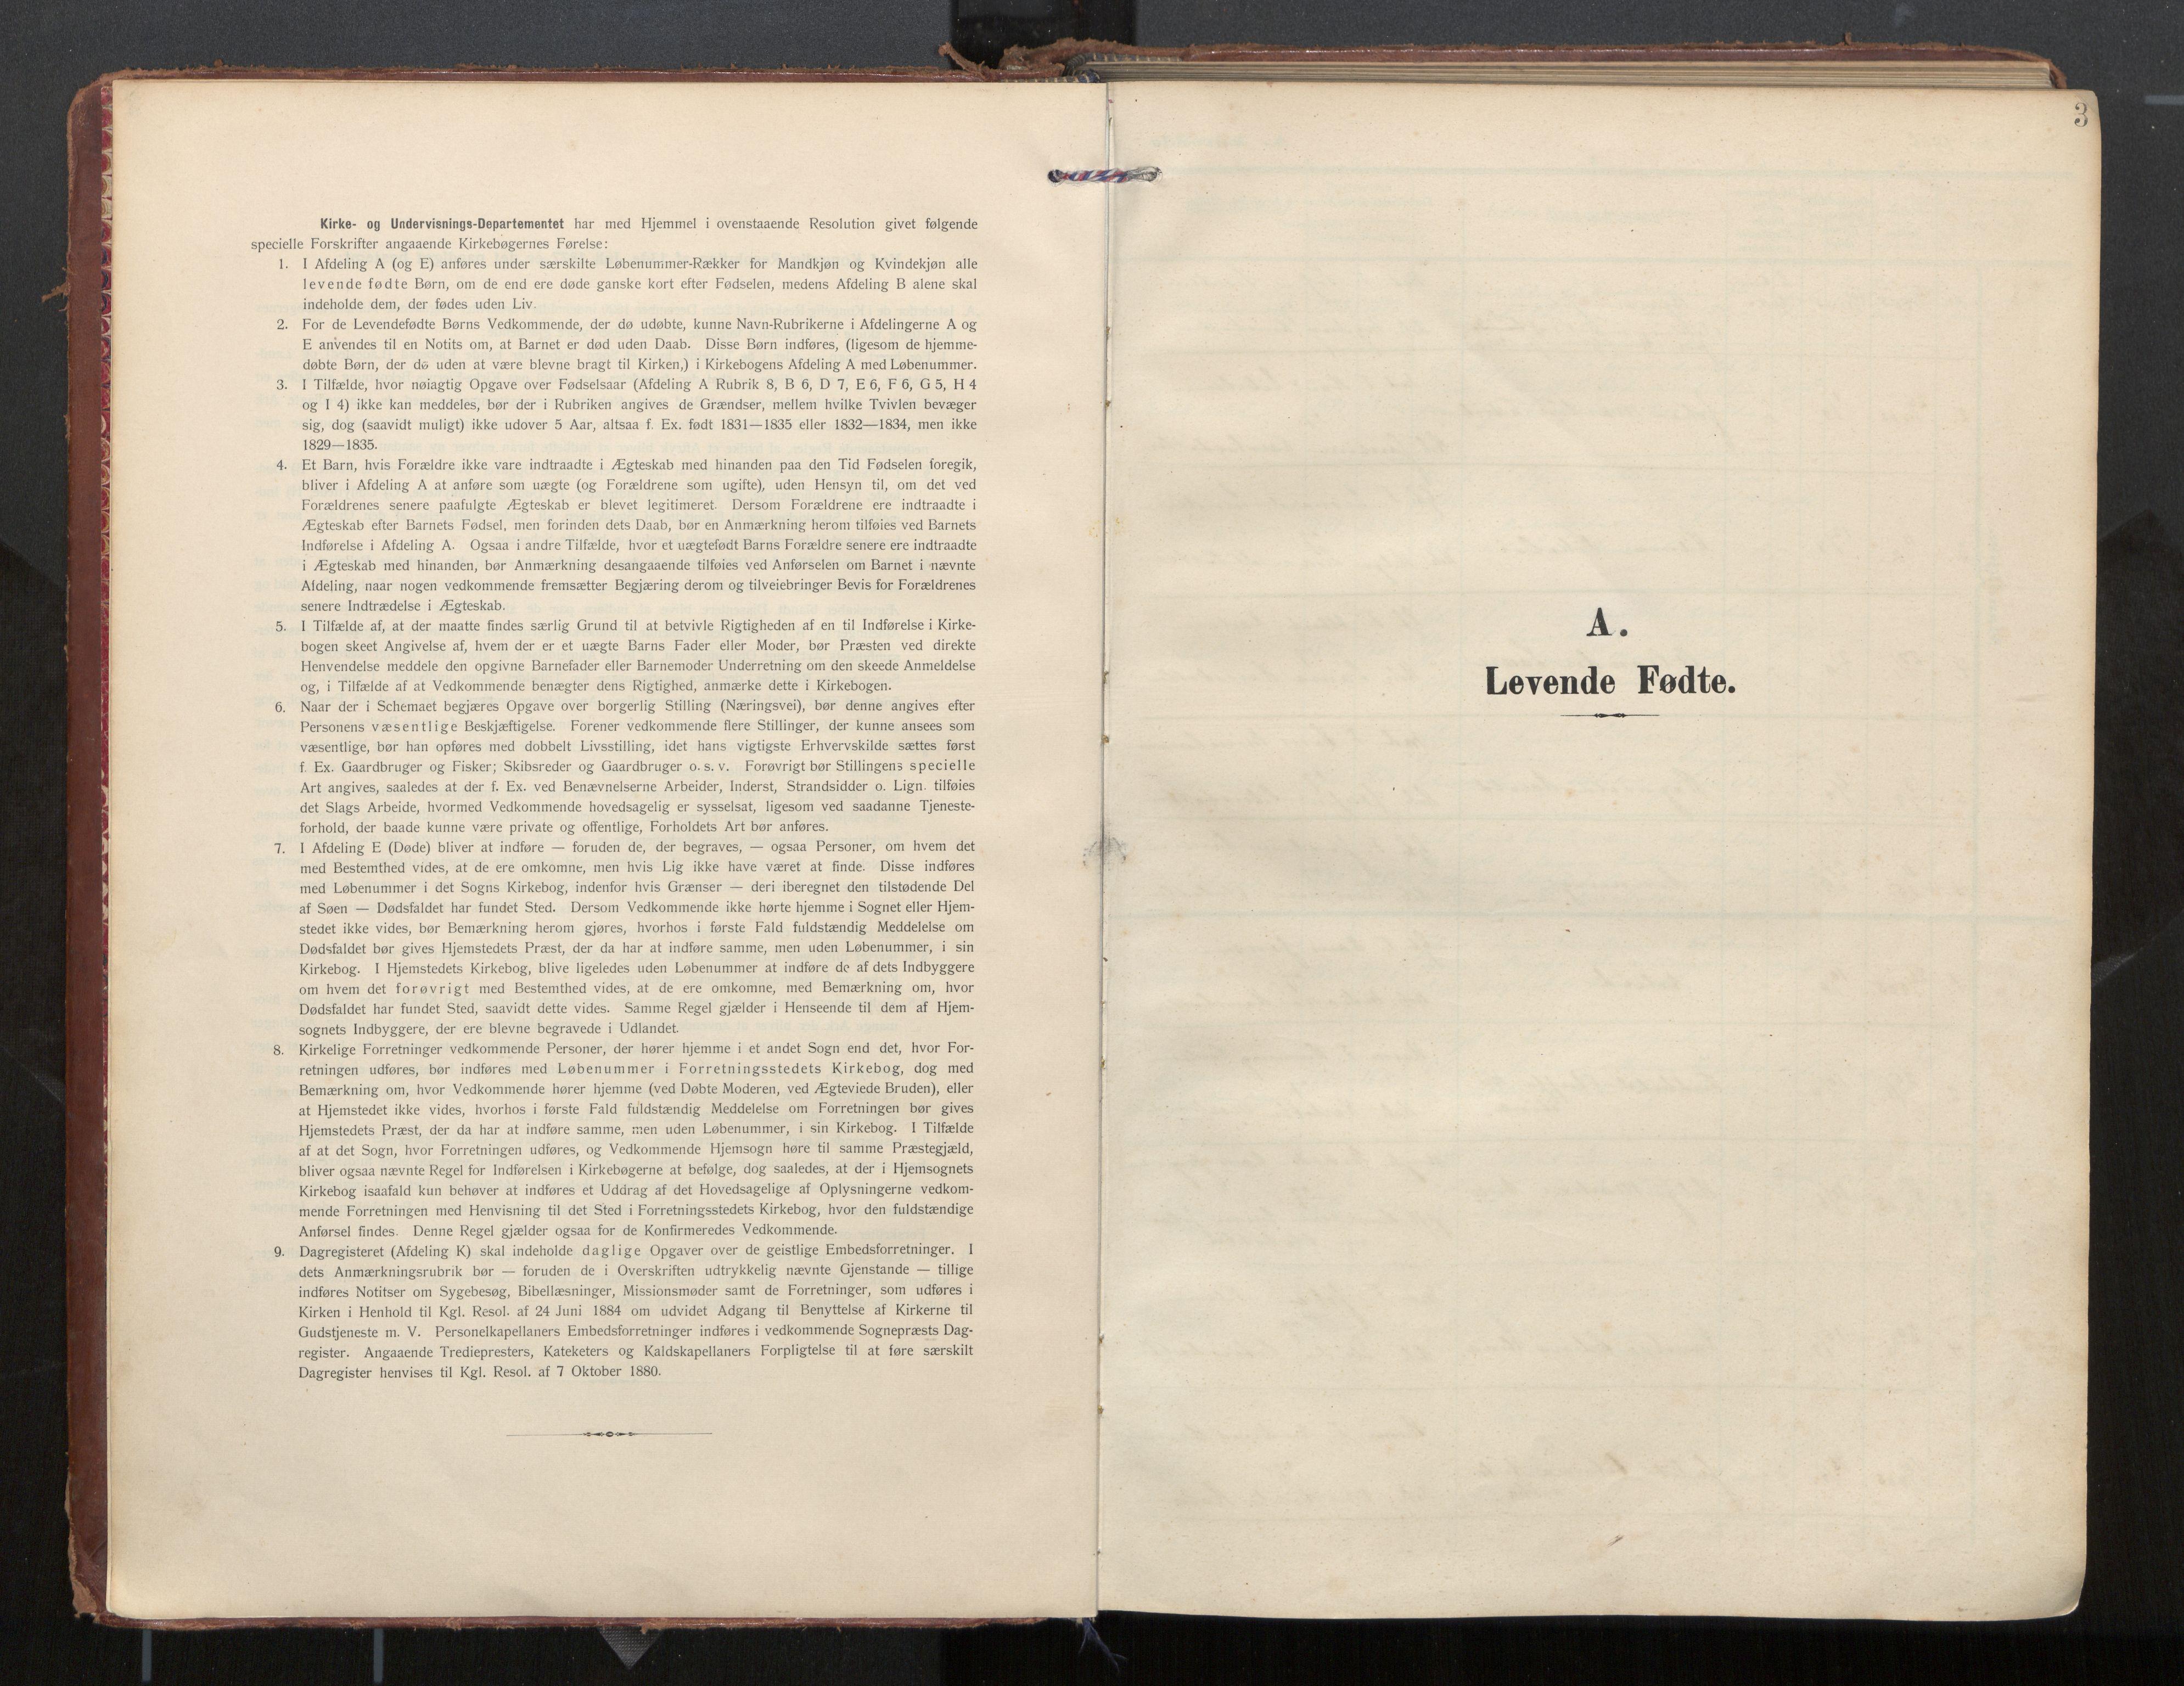 SAT, Ministerialprotokoller, klokkerbøker og fødselsregistre - Nordland, 884/L1194: Ministerialbok nr. 884A02, 1906-1937, s. 3